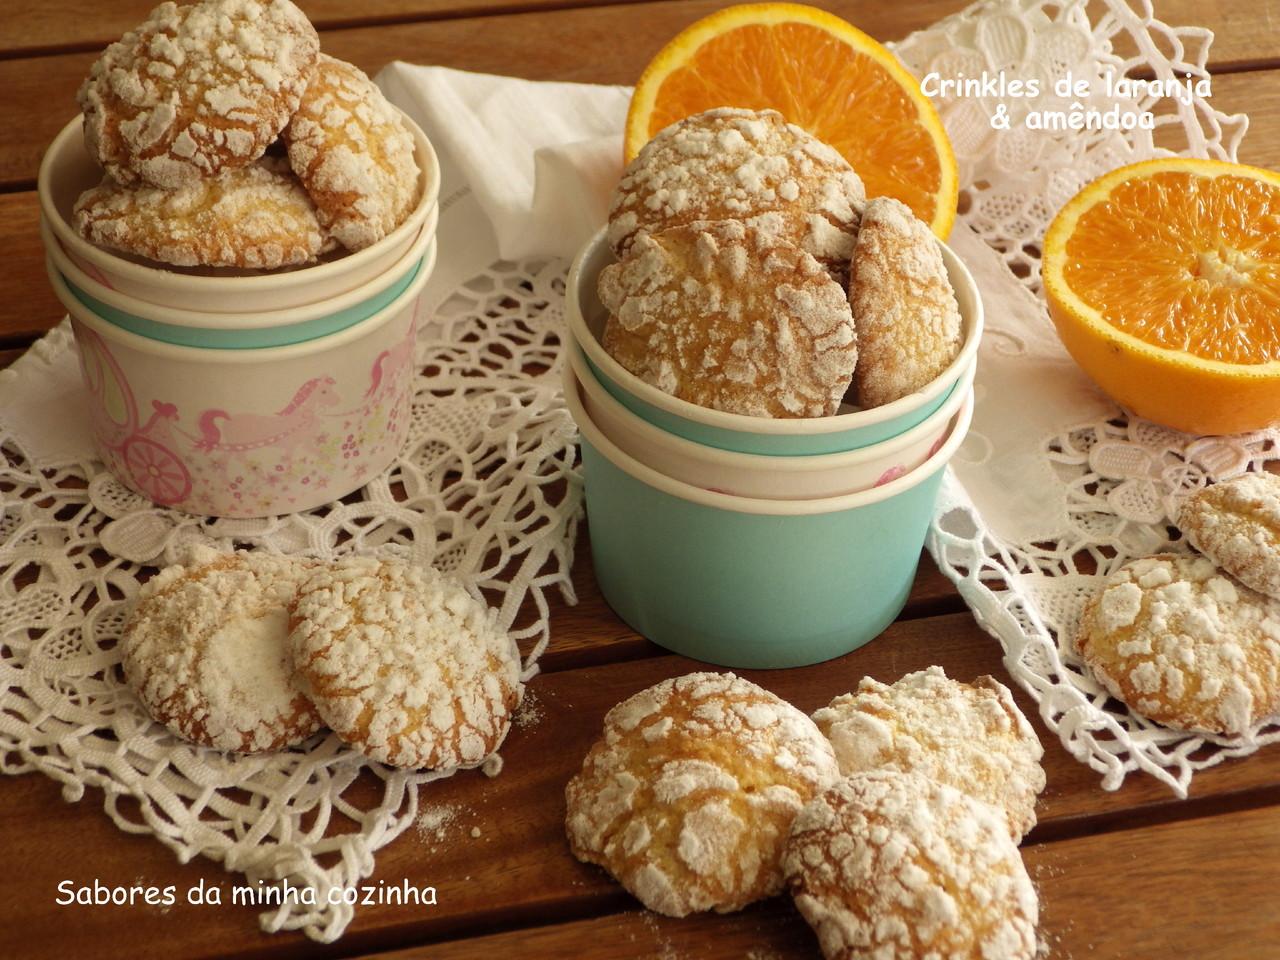 IMGP6320-Crinkles de laranja & amêndoa-Blog.JPG